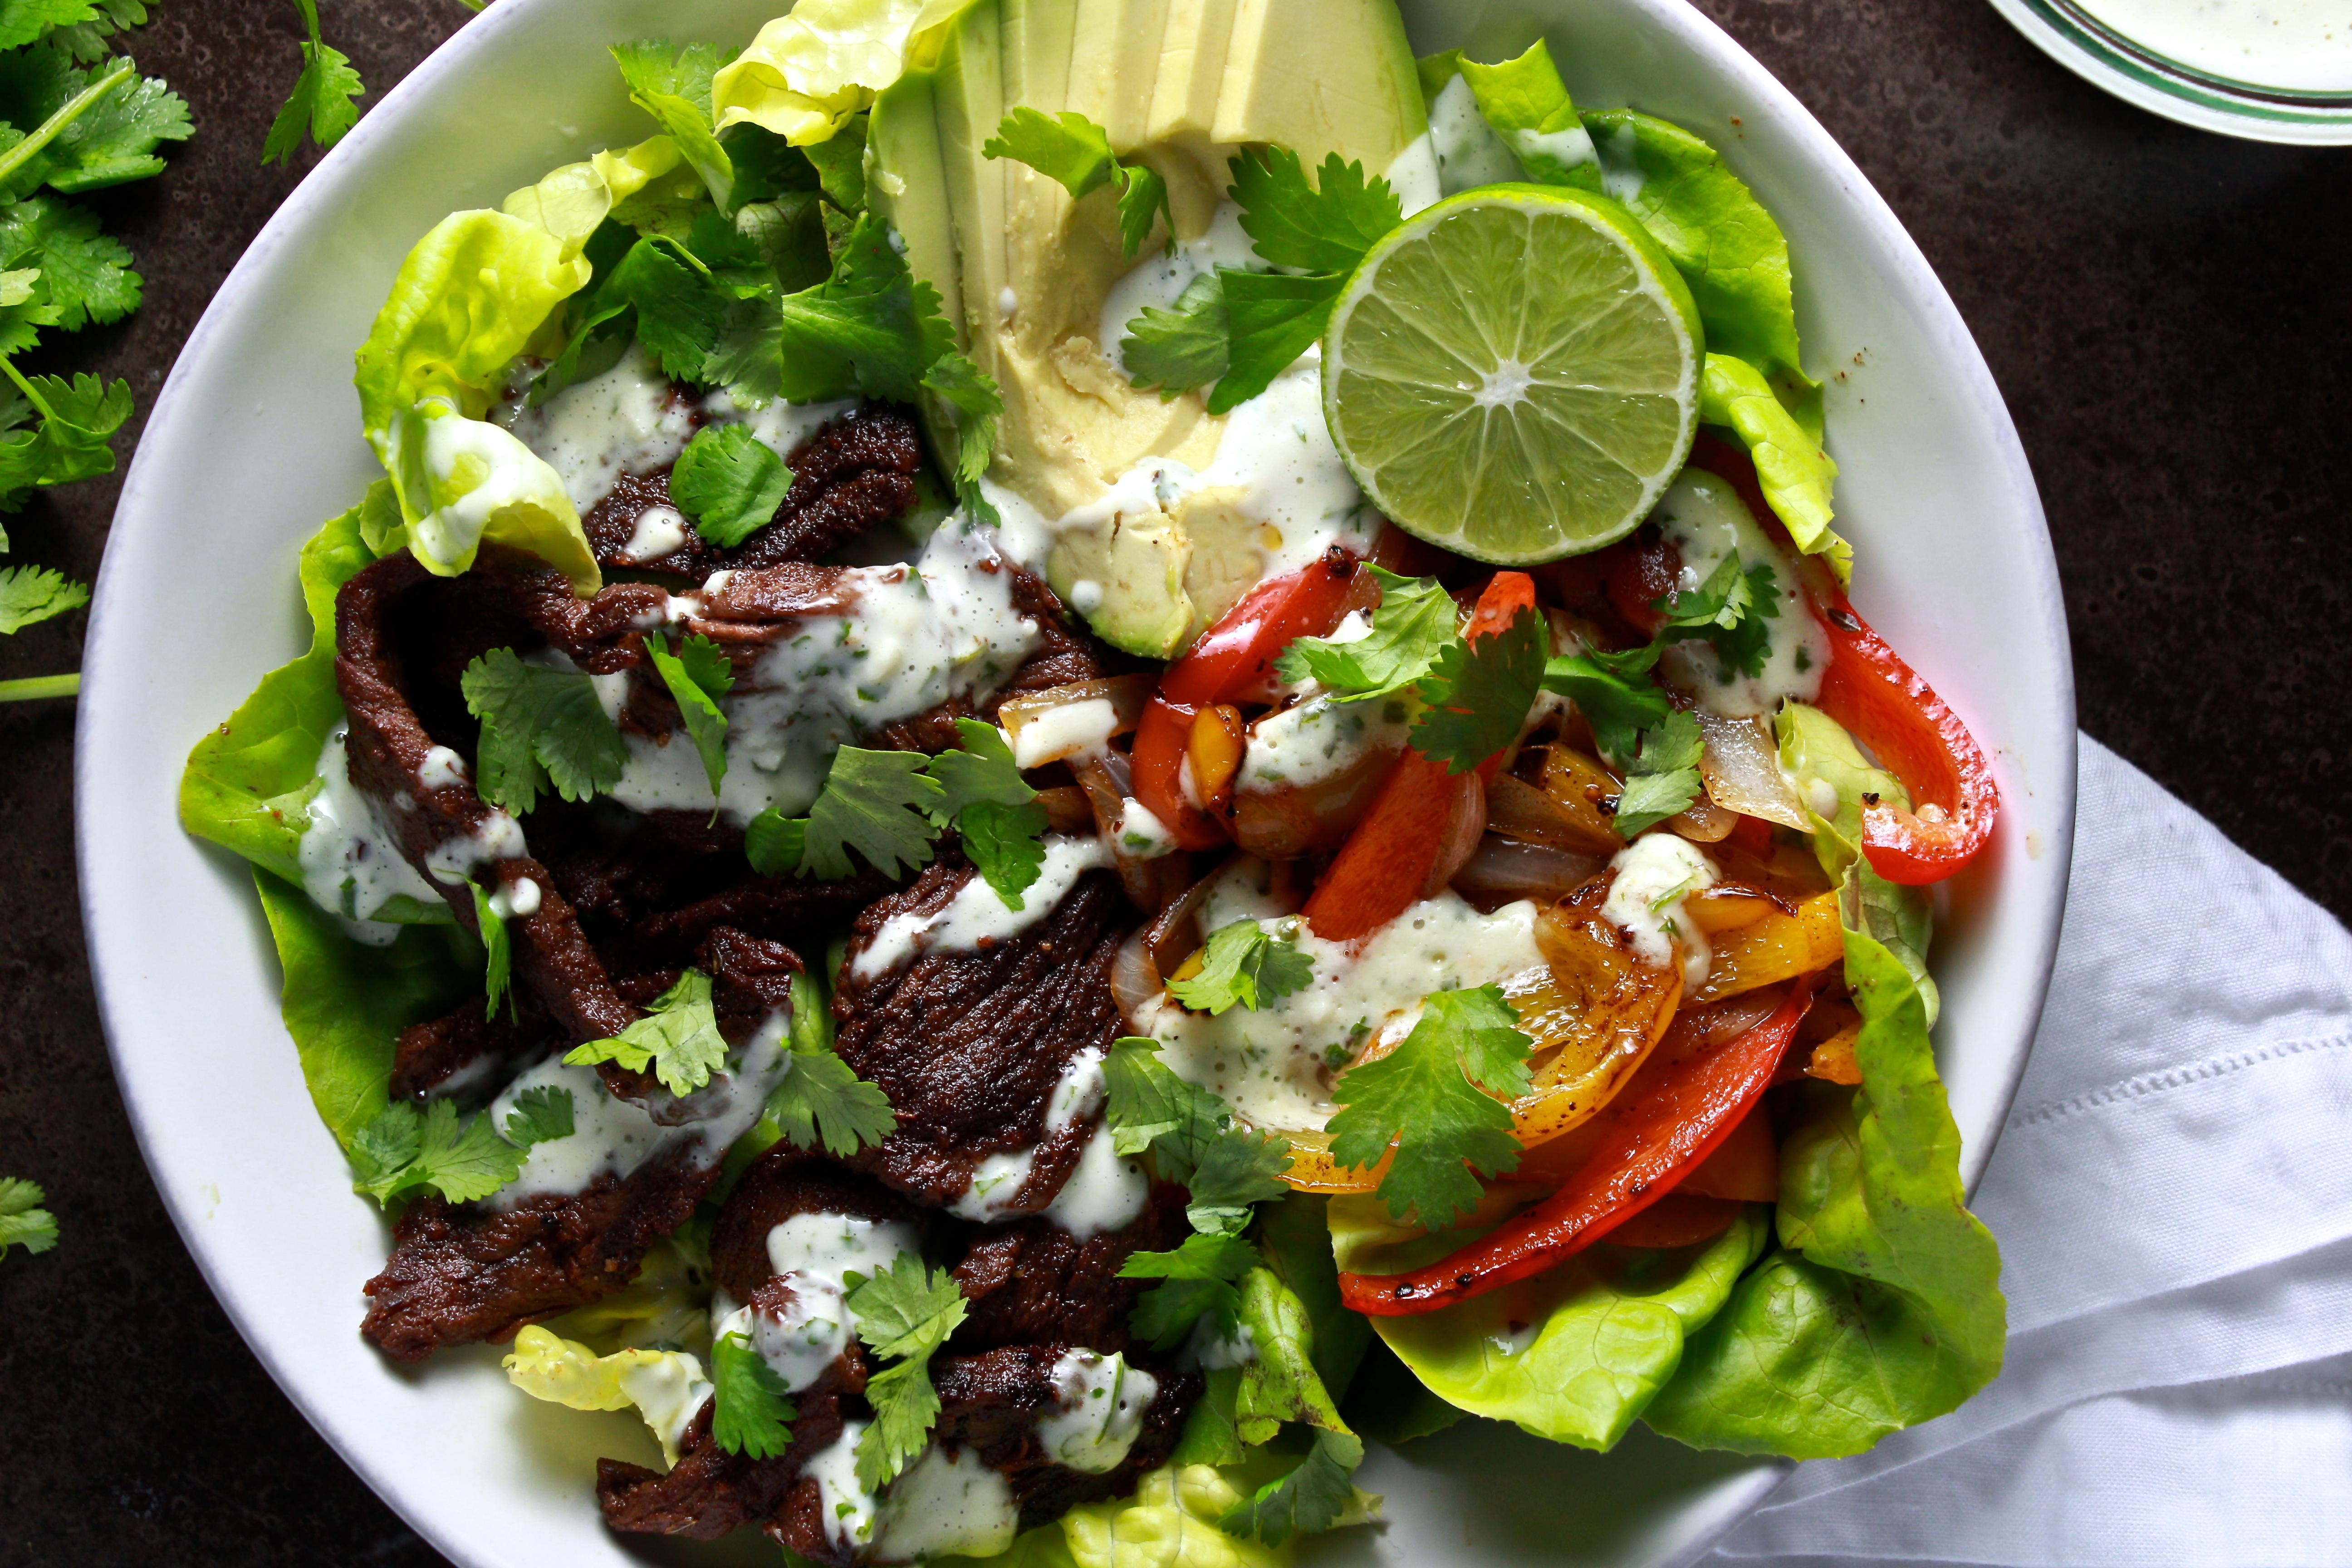 Steak Fajita Salad with Creamy-Cilantro Dressing